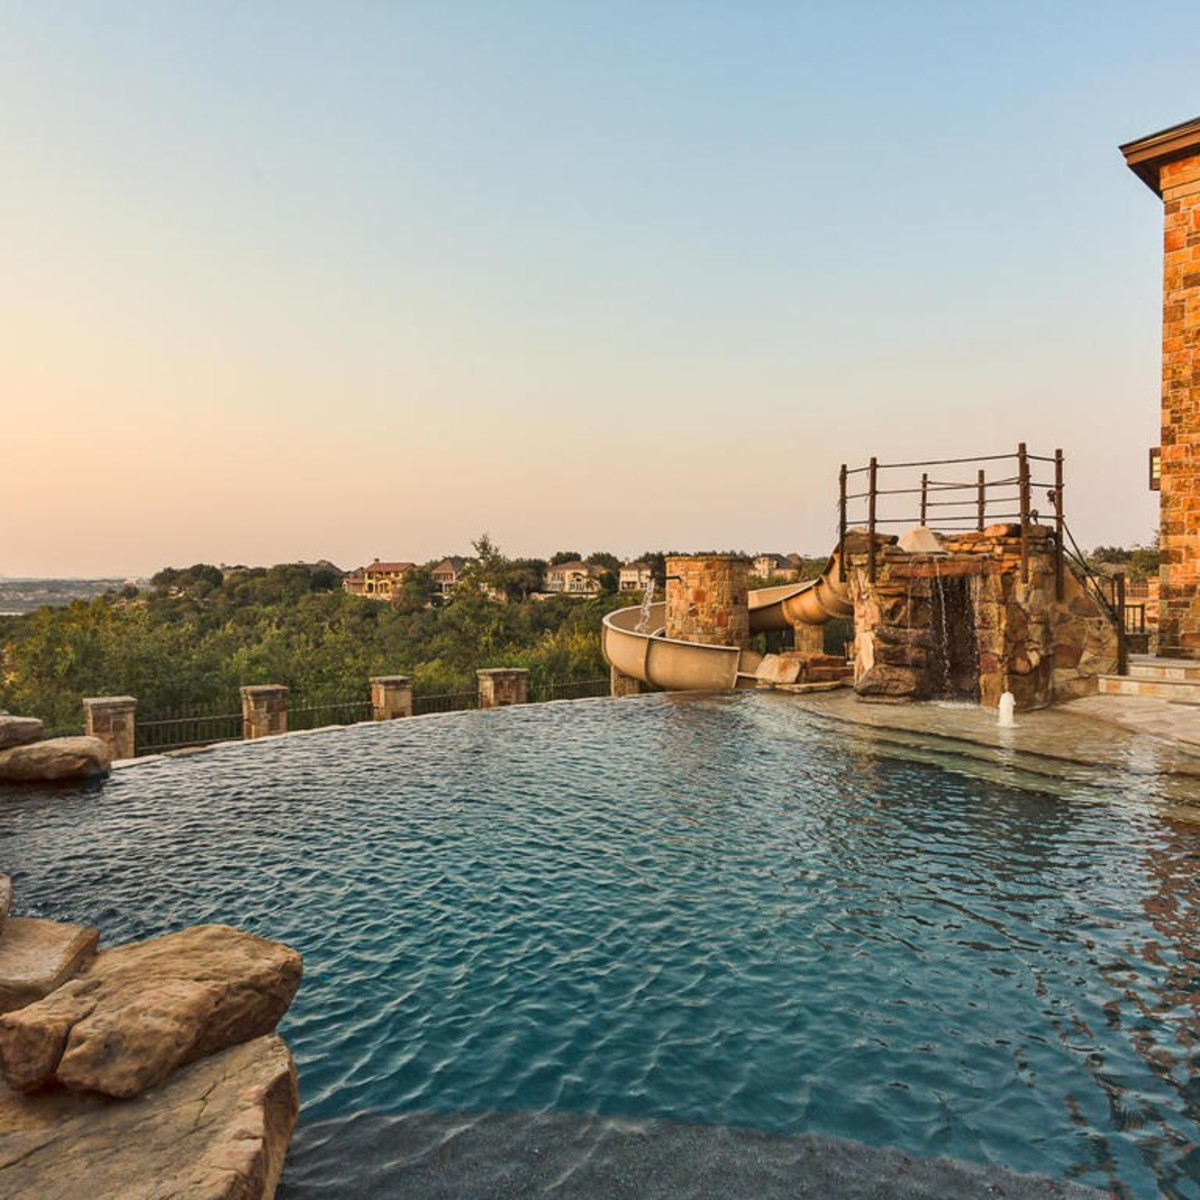 Austin home house 12006 Pleasant Panorama View 78738 Jeff Kent April 2016 pool